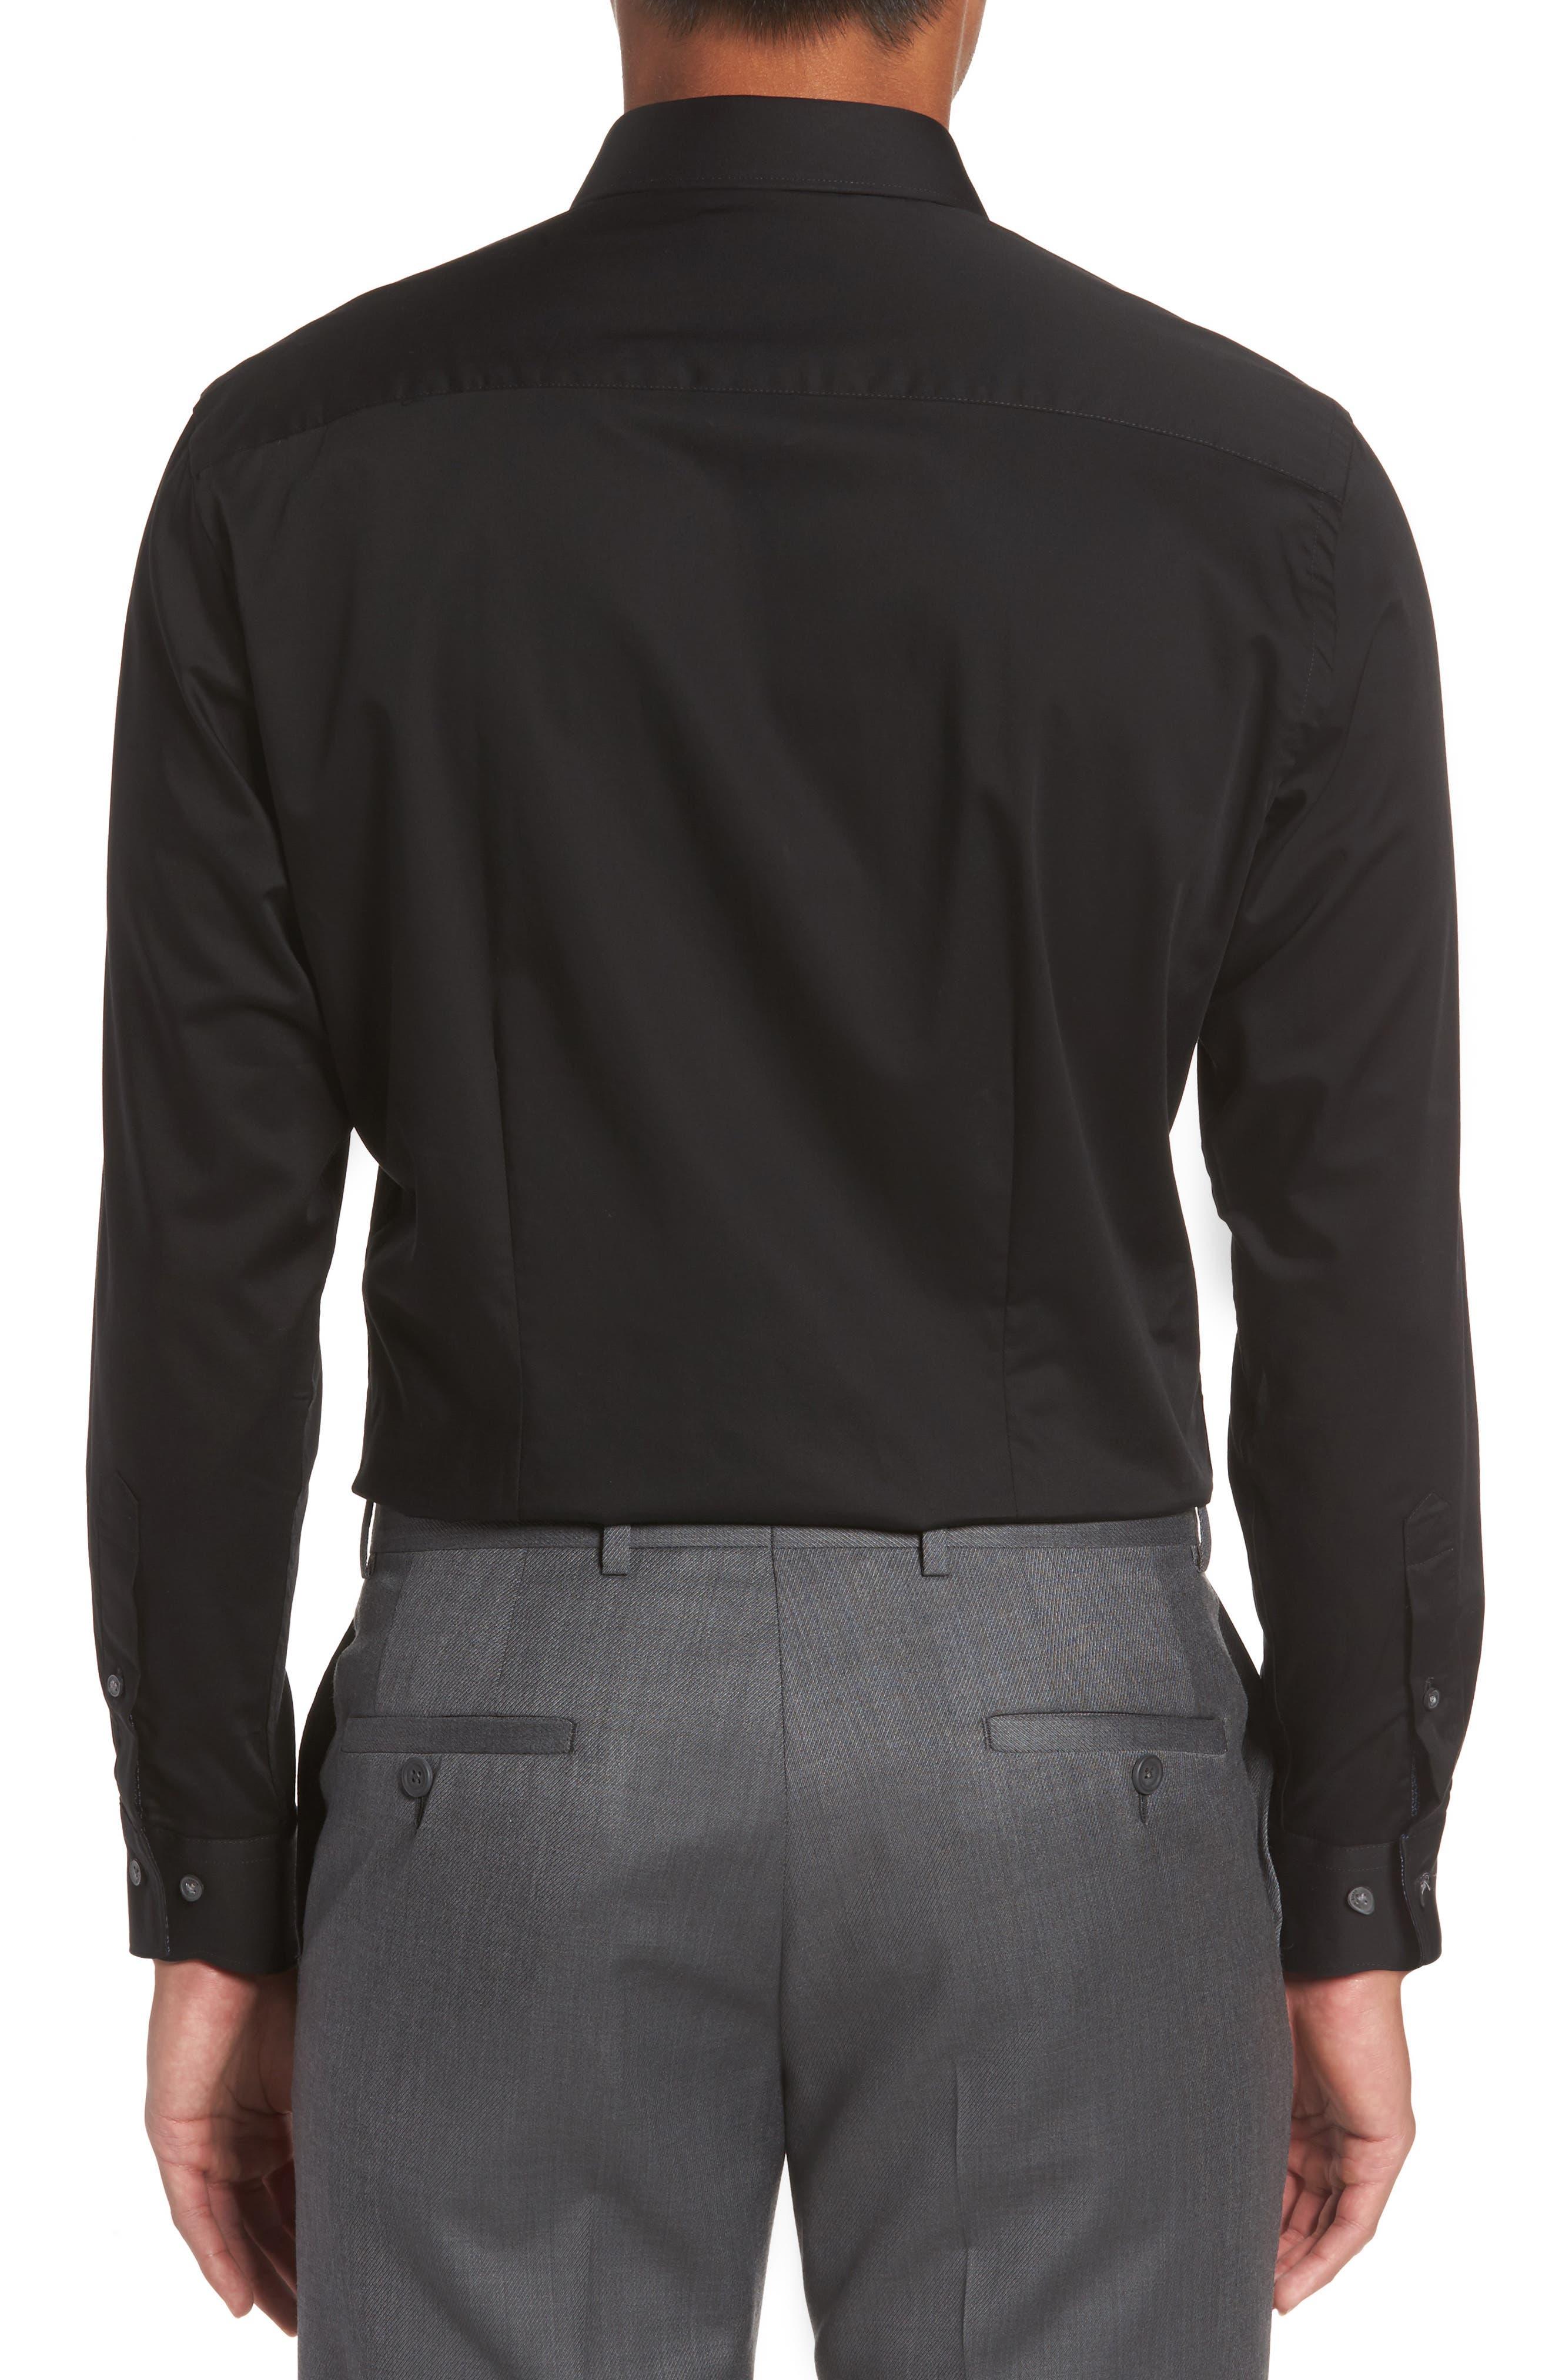 Caramor Trim Fit Solid Dress Shirt,                             Alternate thumbnail 2, color,                             BLACK